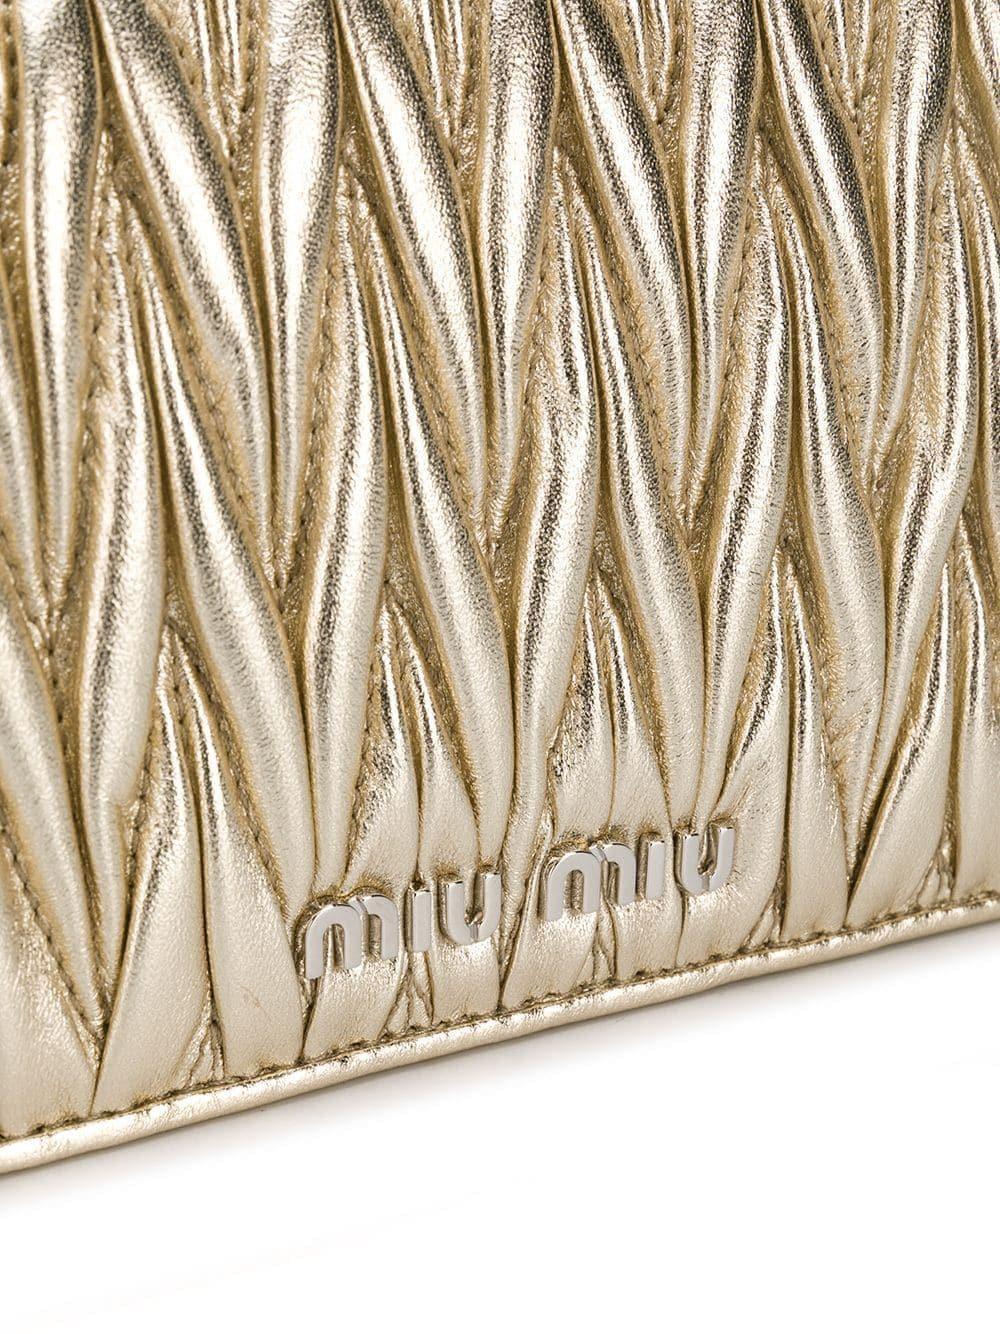 Miu Miu Leather Matelassé Cross-body Bag in Metallic